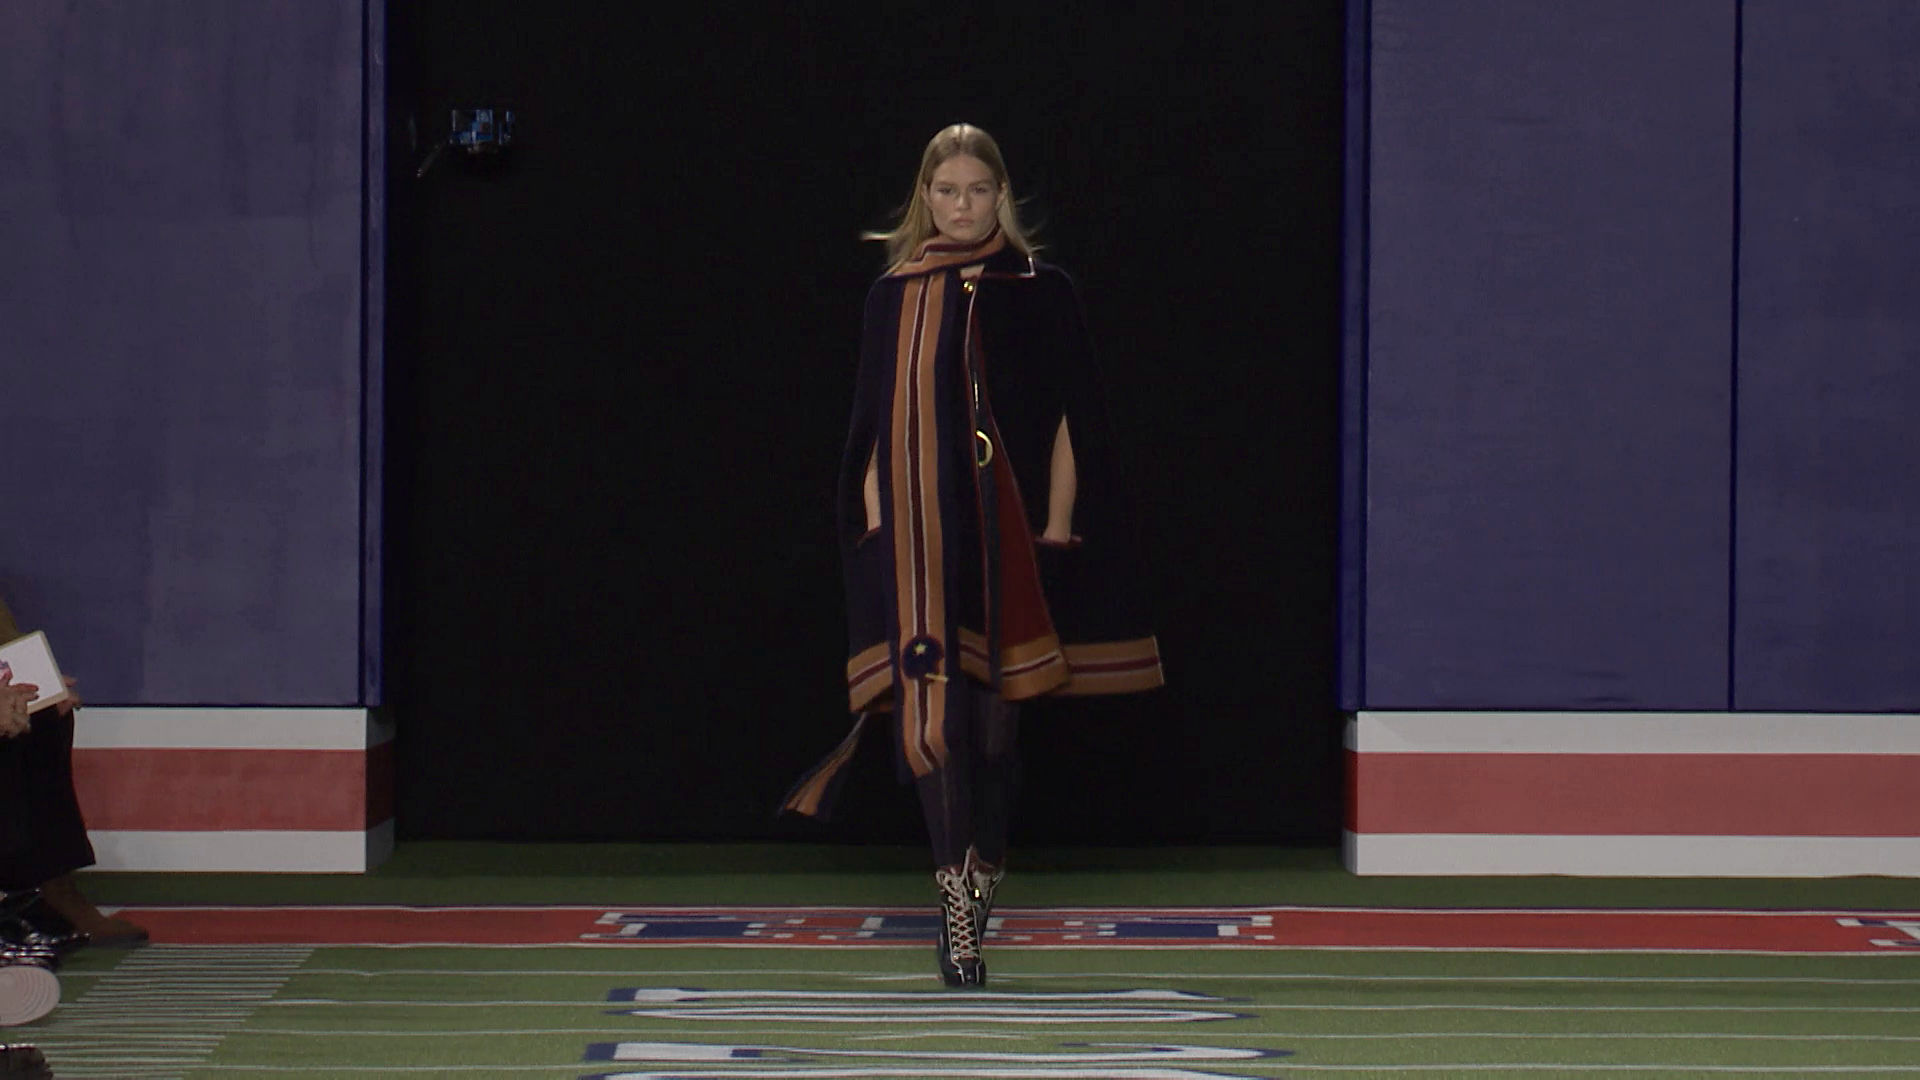 Tommy Hilfiger Fall Winter 2015-16 Women's Fashion Show - New York Fashion Week